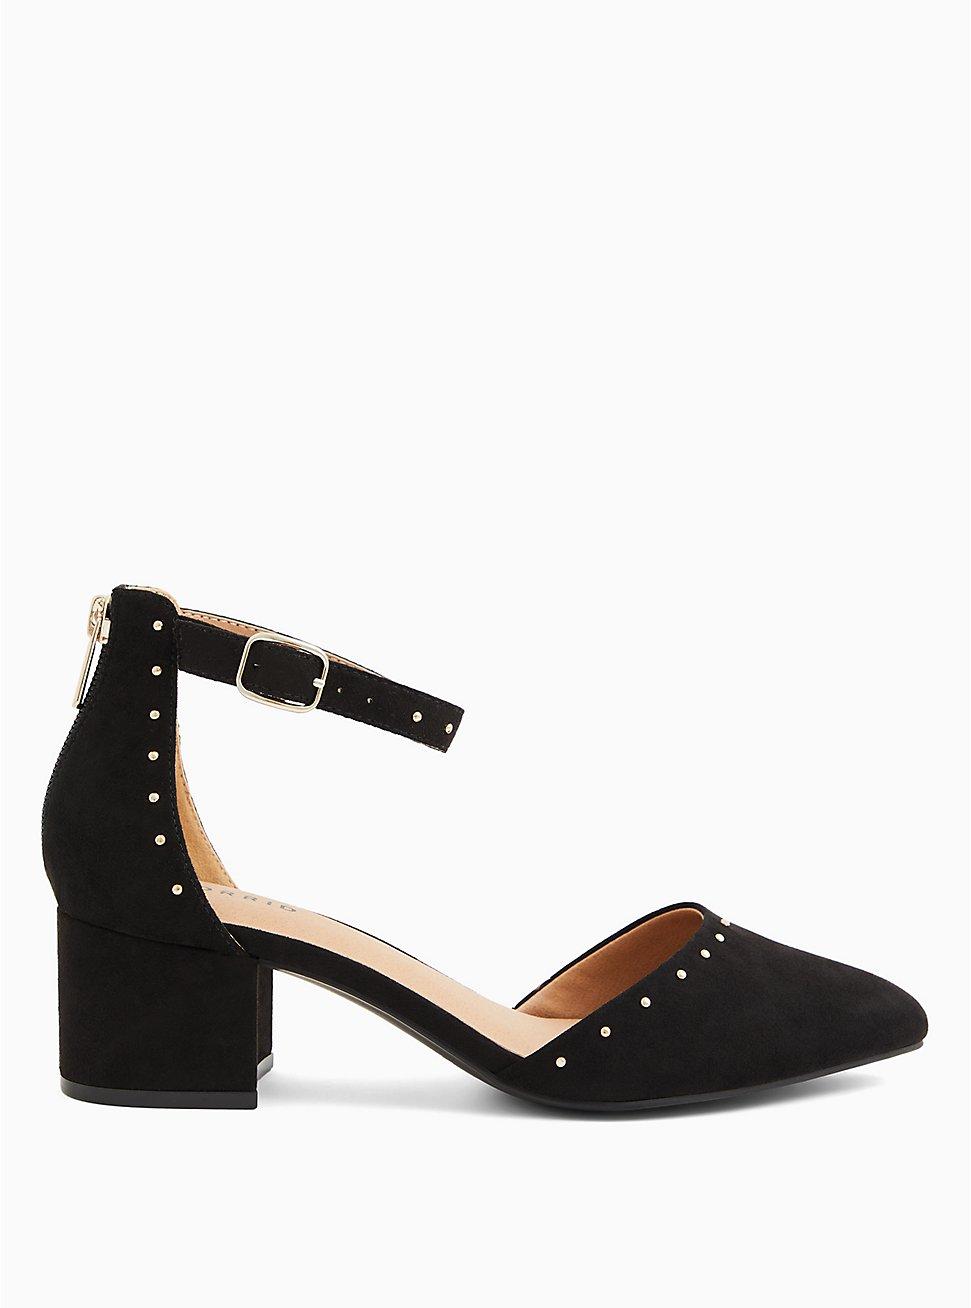 Black Faux Suede Studded D'Orsay Block Heel Pump (WW), BLACK, hi-res